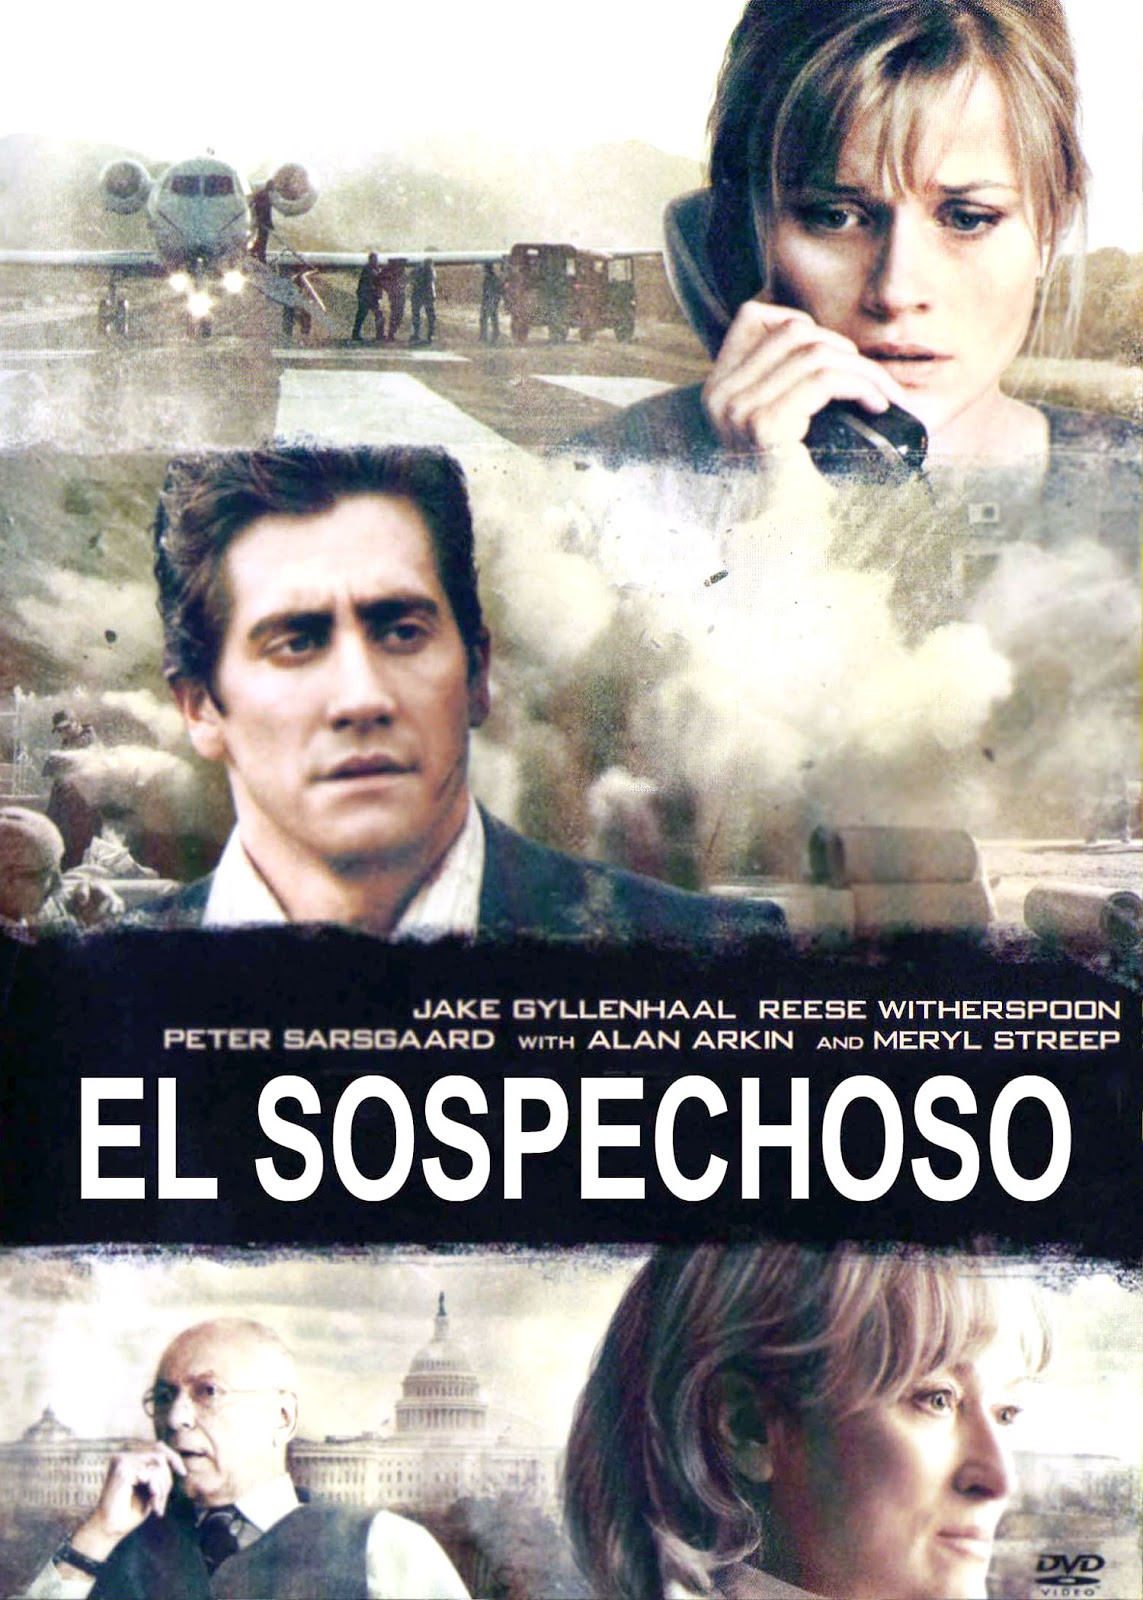 http://4.bp.blogspot.com/-rHtT6QicZno/UIlaPH_v6FI/AAAAAAAAKJQ/7C_CX0QR9Qg/s1600/El+Sospechoso+(Rendition).jpg